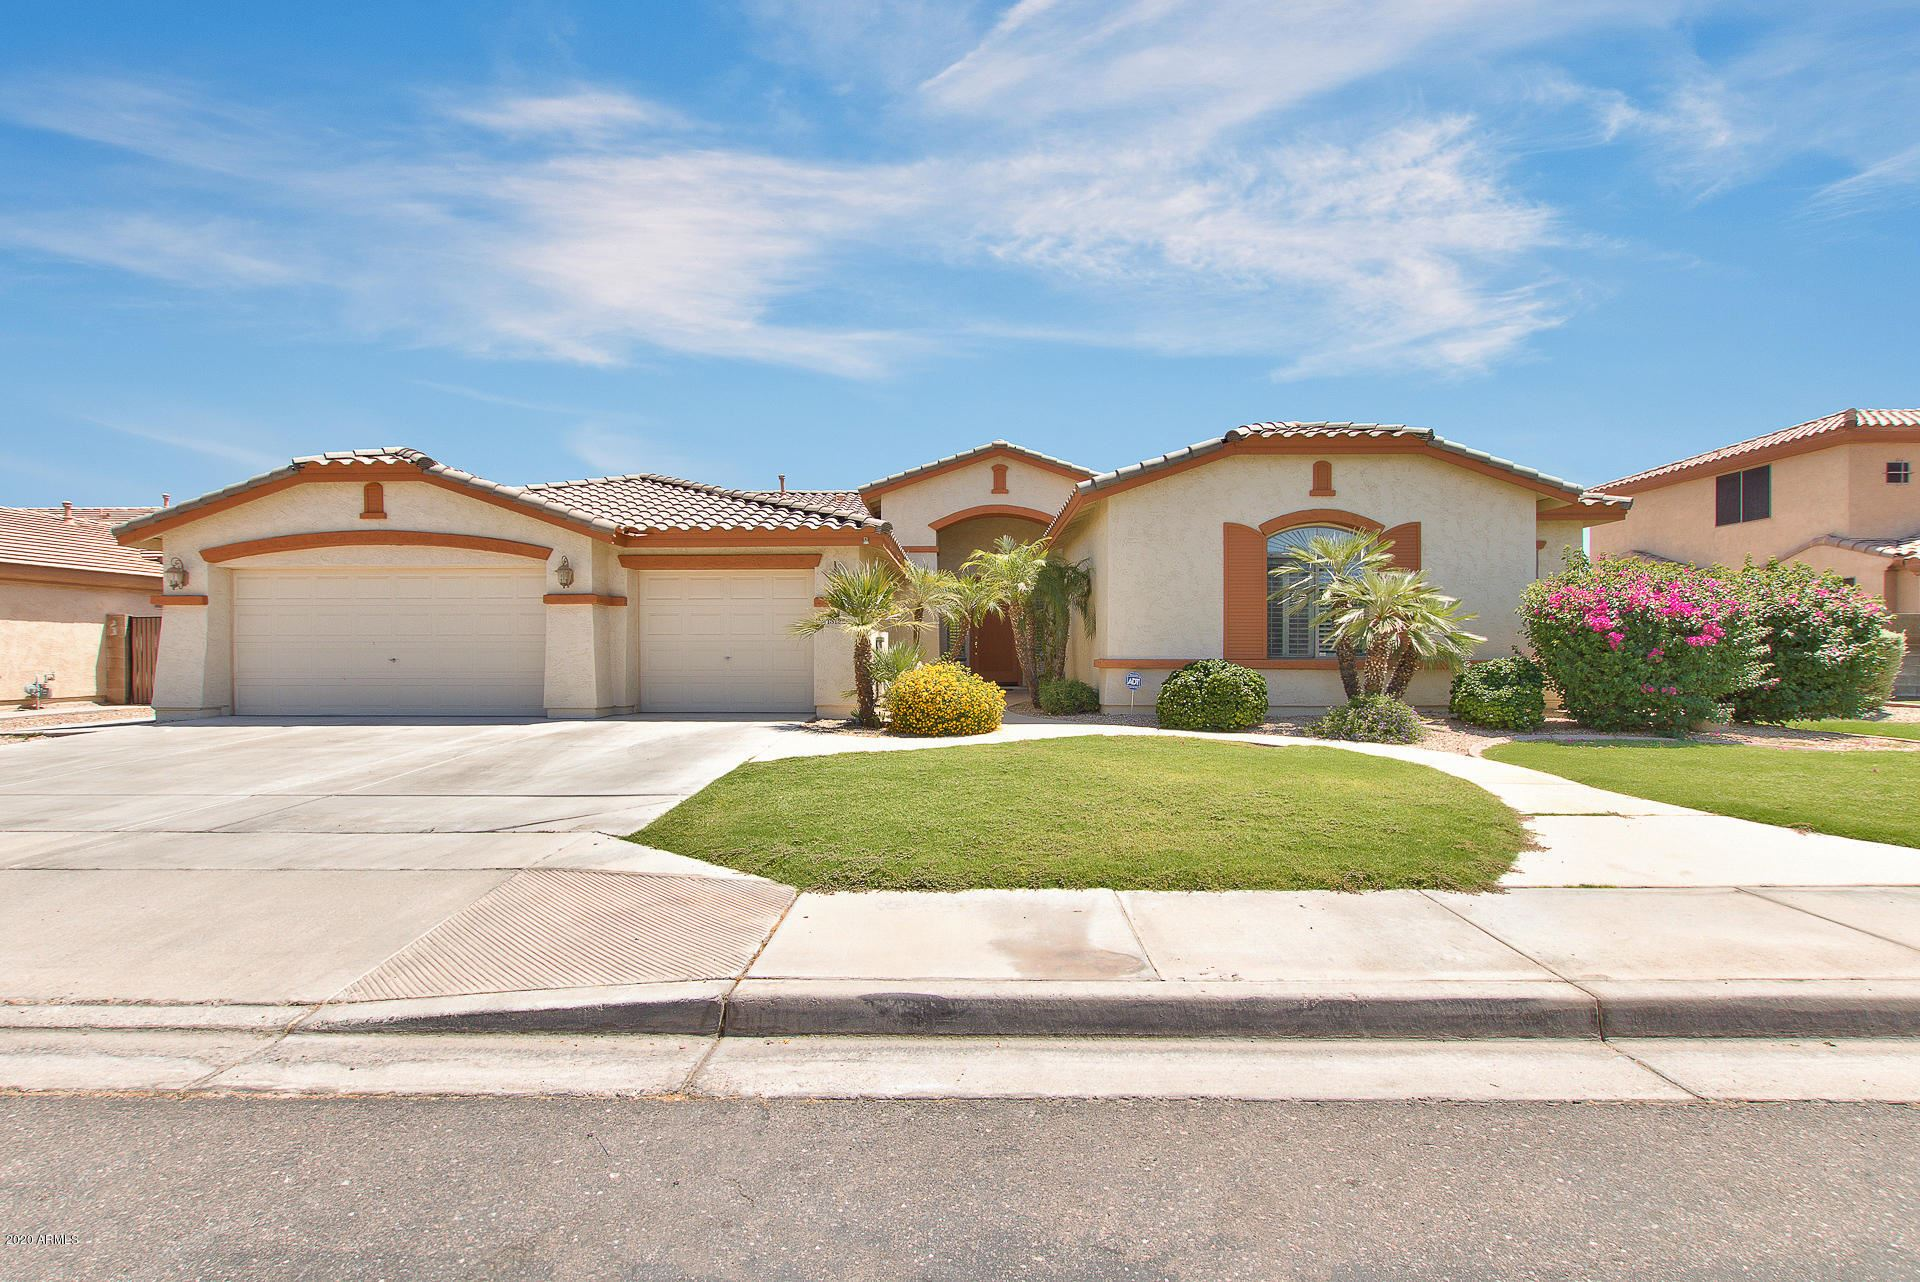 13125 W RANCHO Drive, Litchfield Park, AZ 85340 - MLS#: 6105220